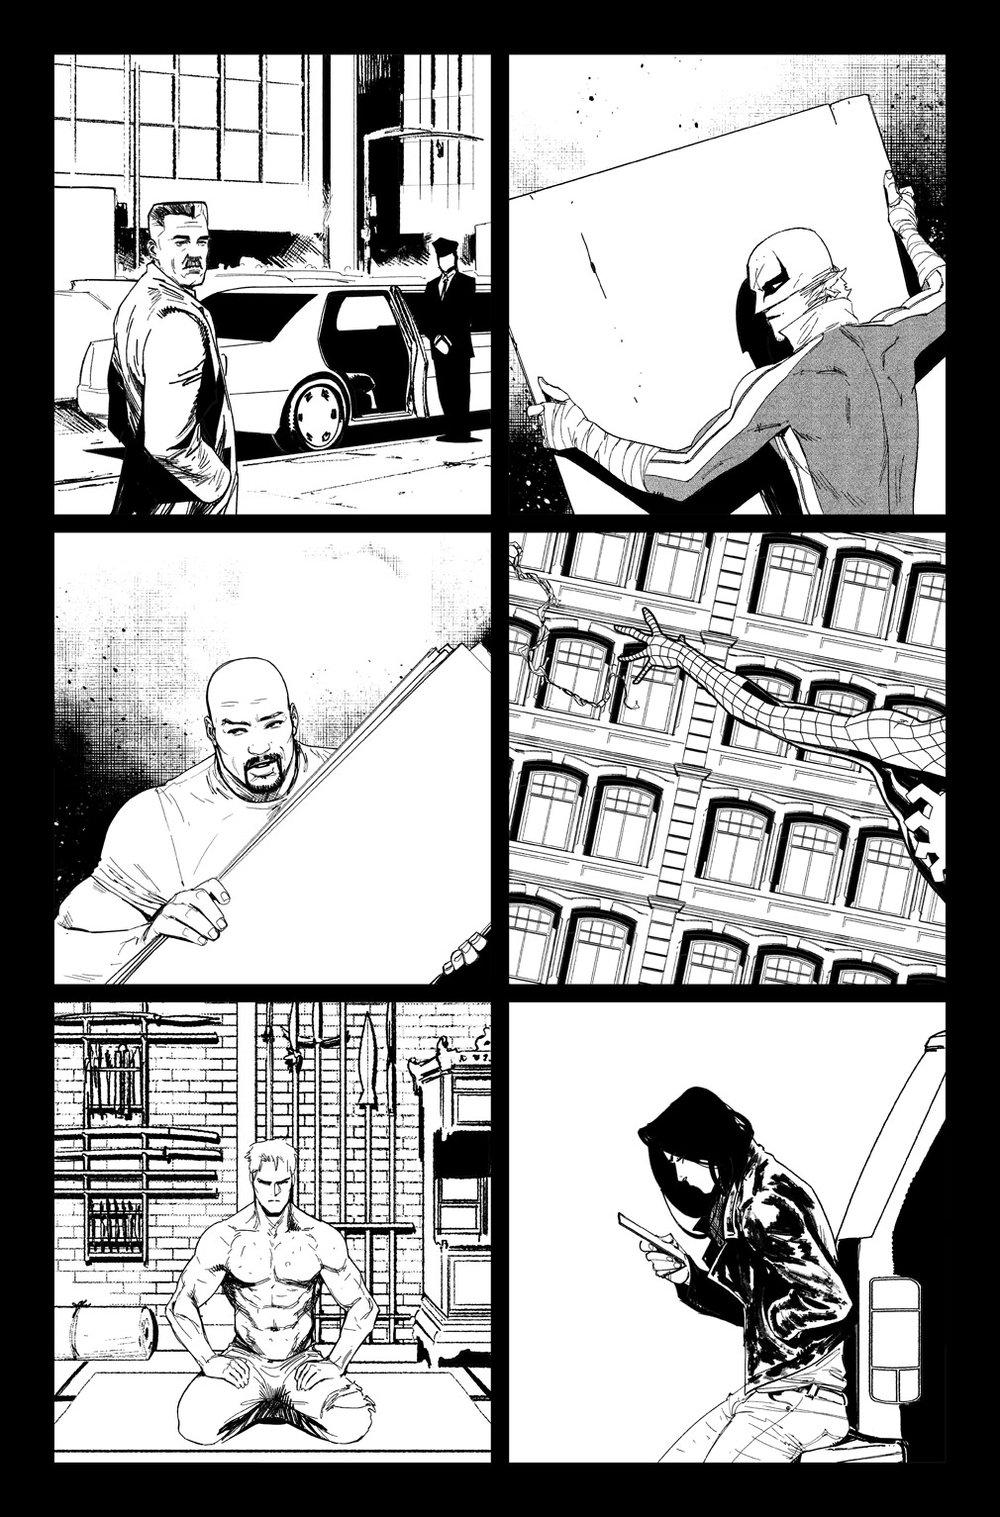 Image of DEFENDERS #10, p.06 ARTIST'S PROOF